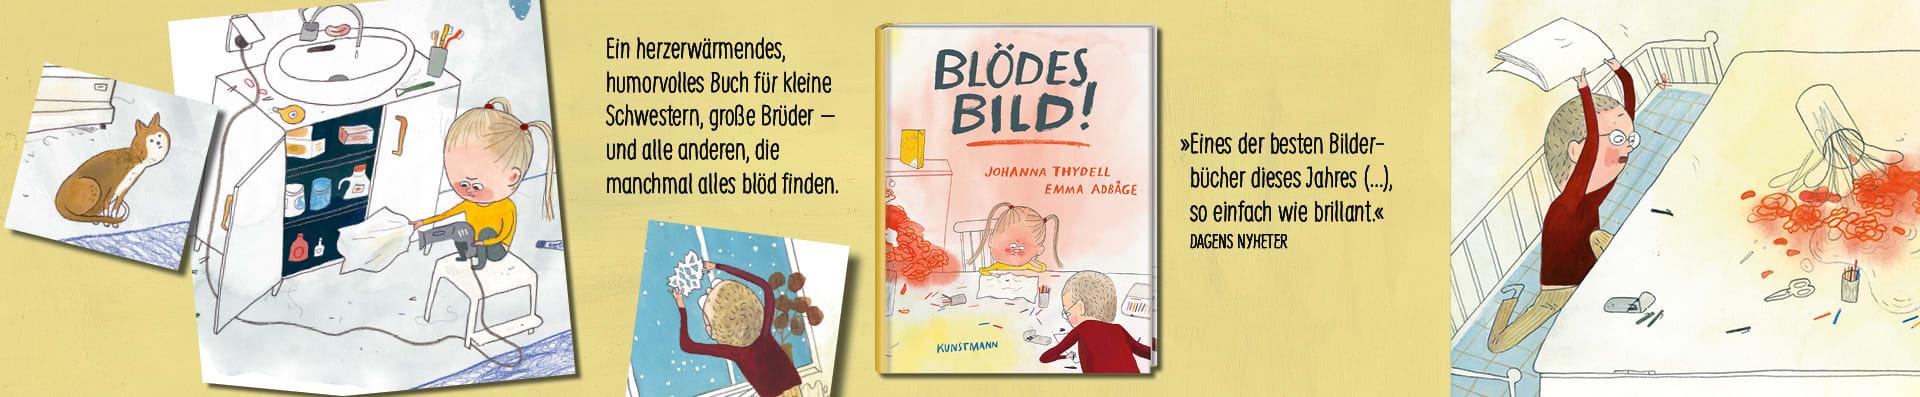 Johanna Thydell | Emma AdBage – Blödes Bild!